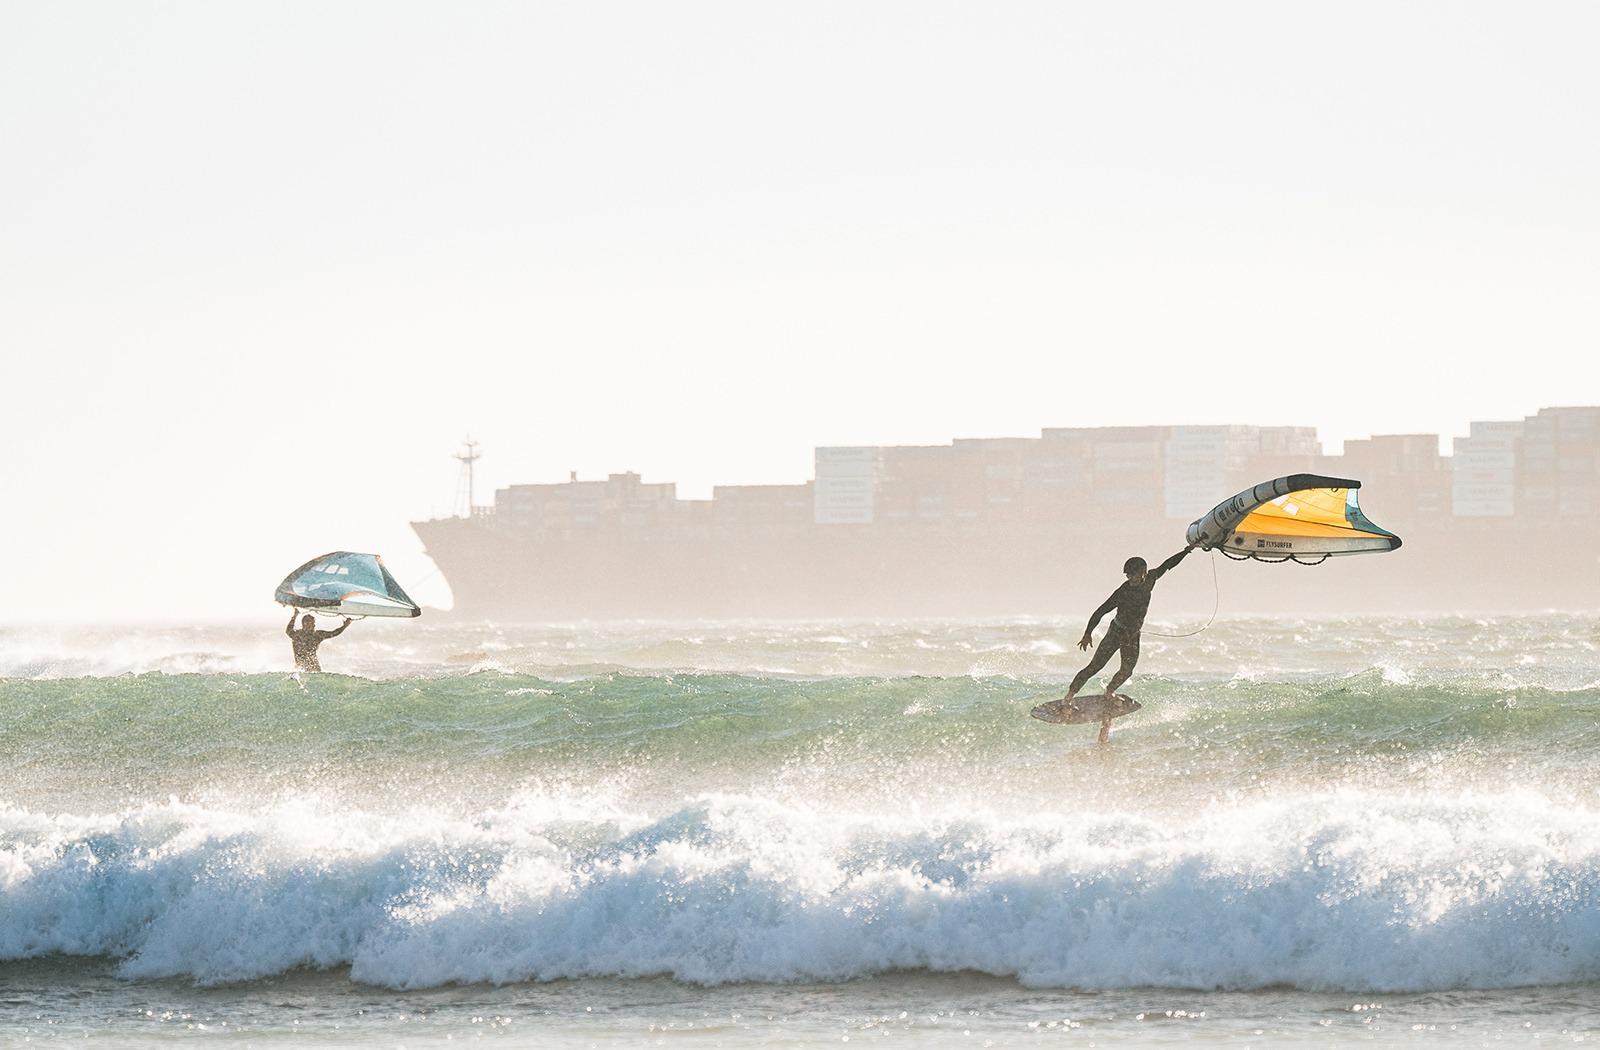 Flysurfer-MOJO-03-by-MiriamJoanna